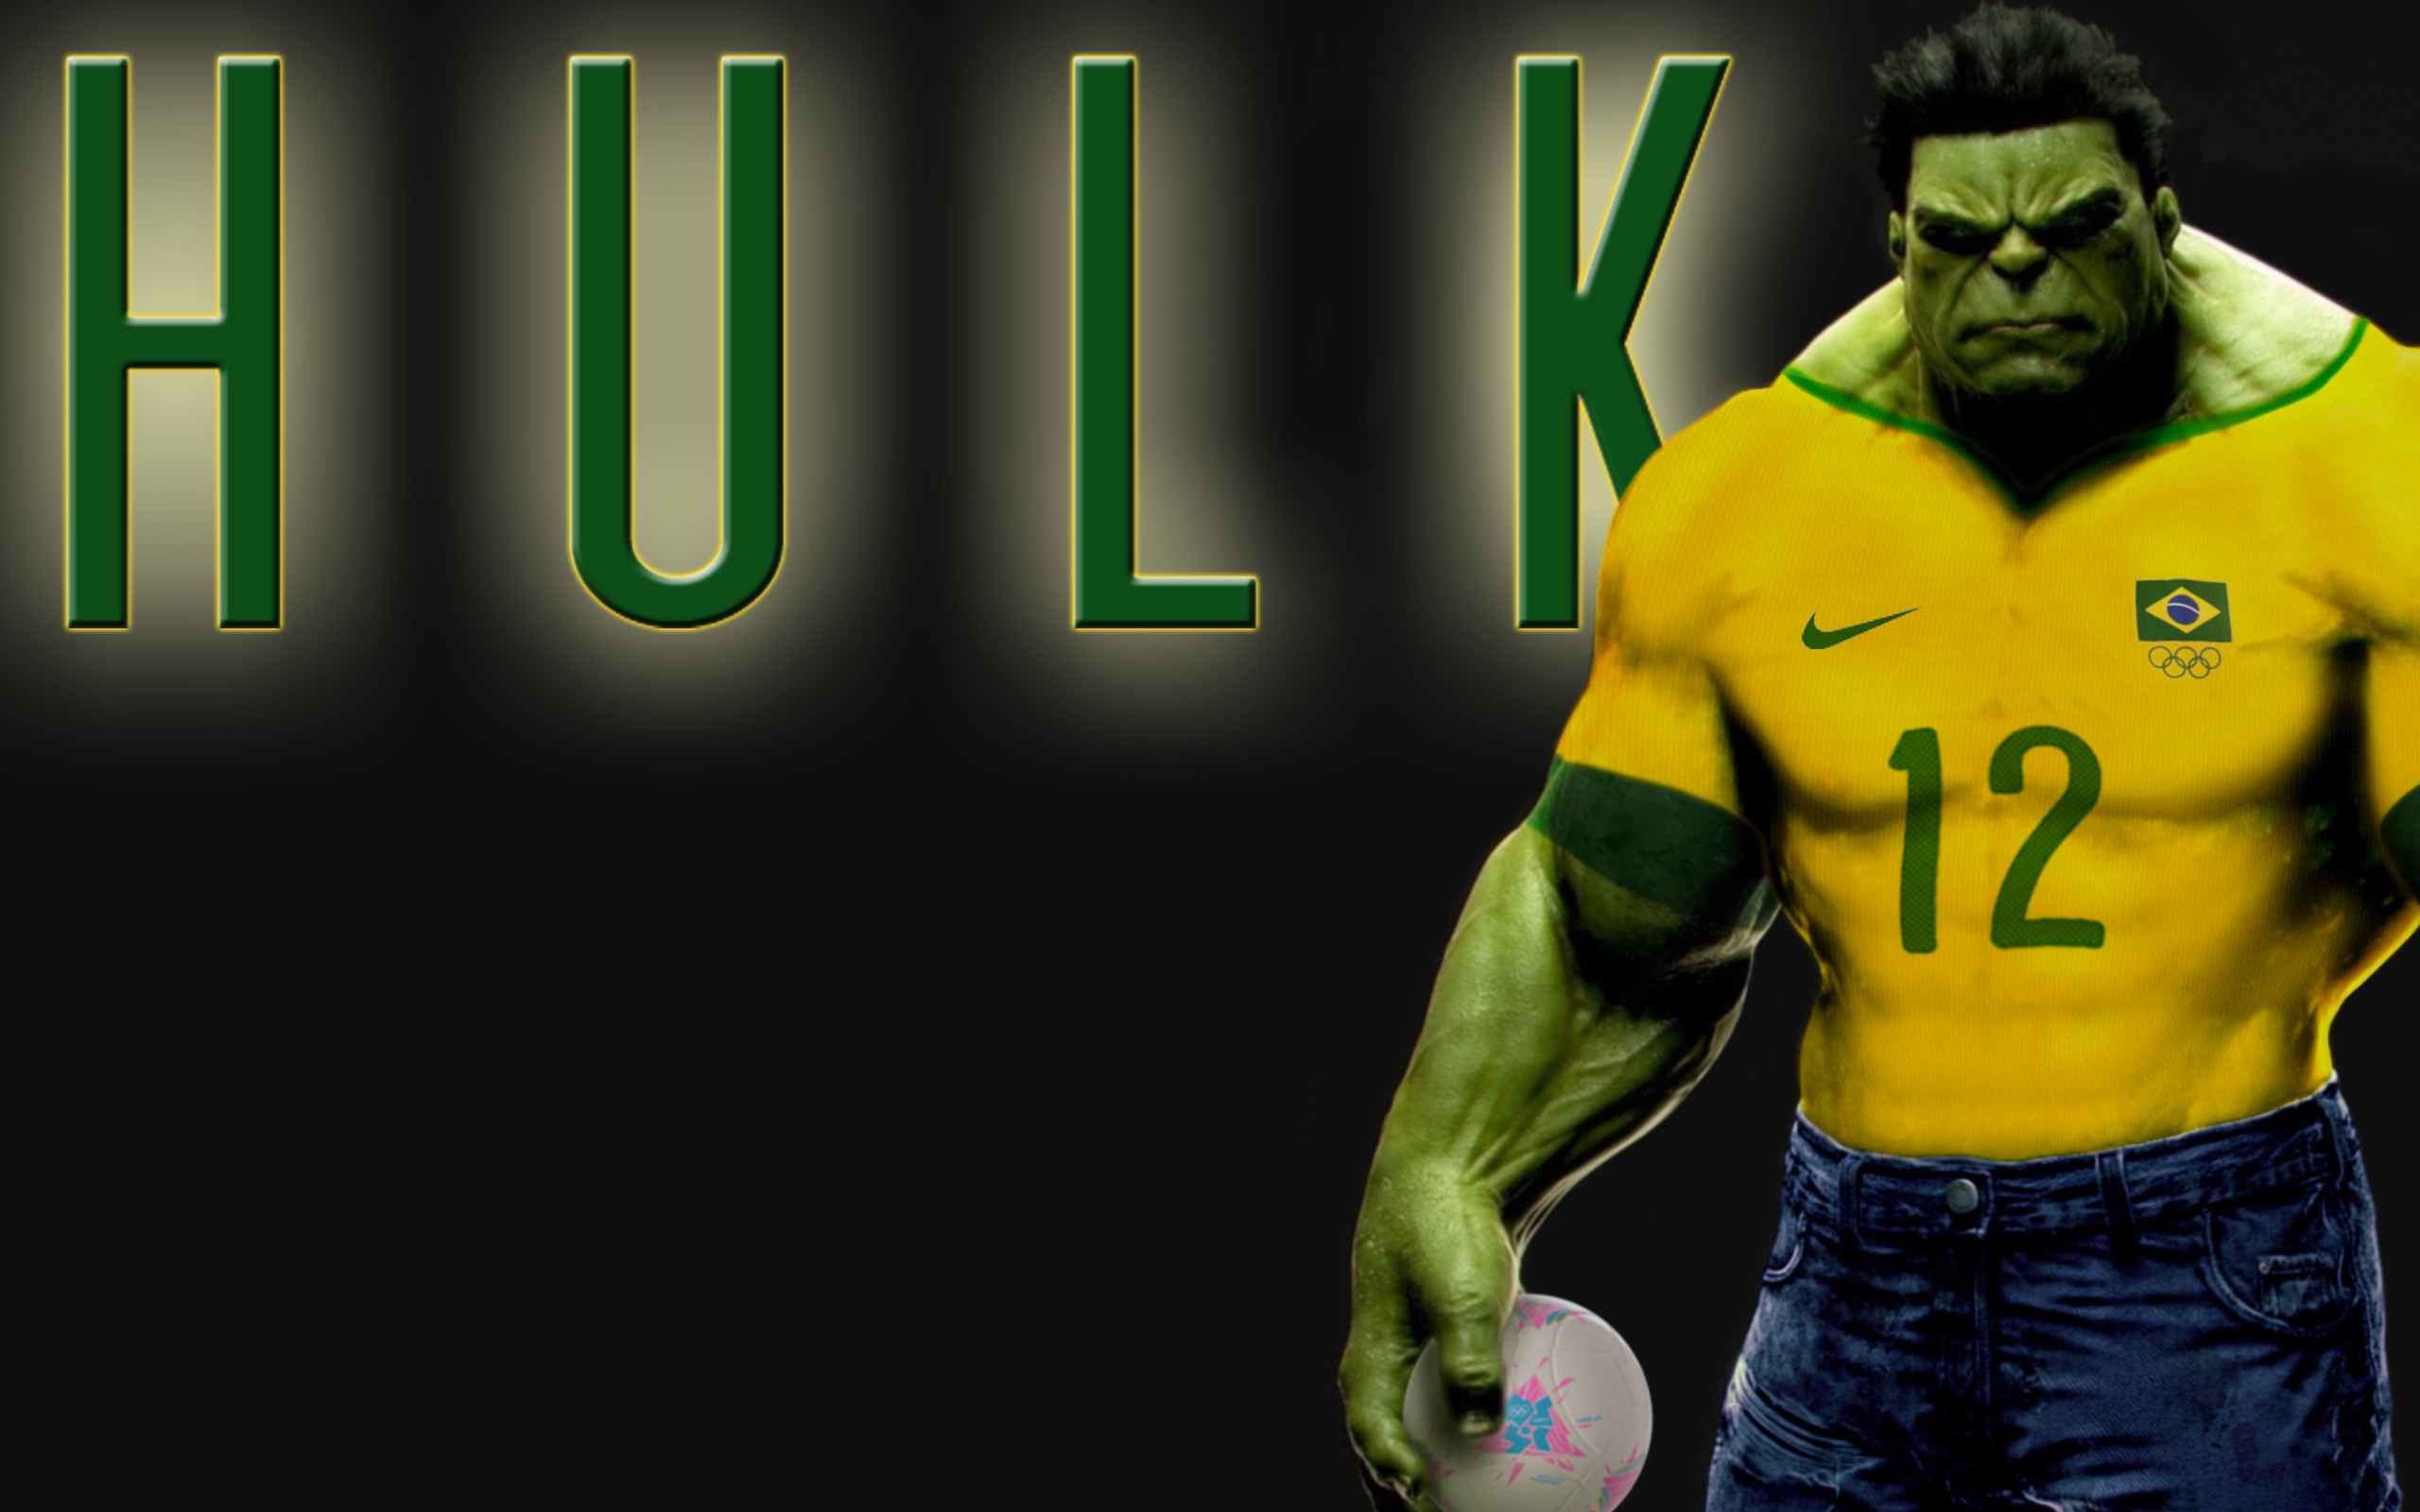 Hulk HD wallpaper backgrounds soccer.